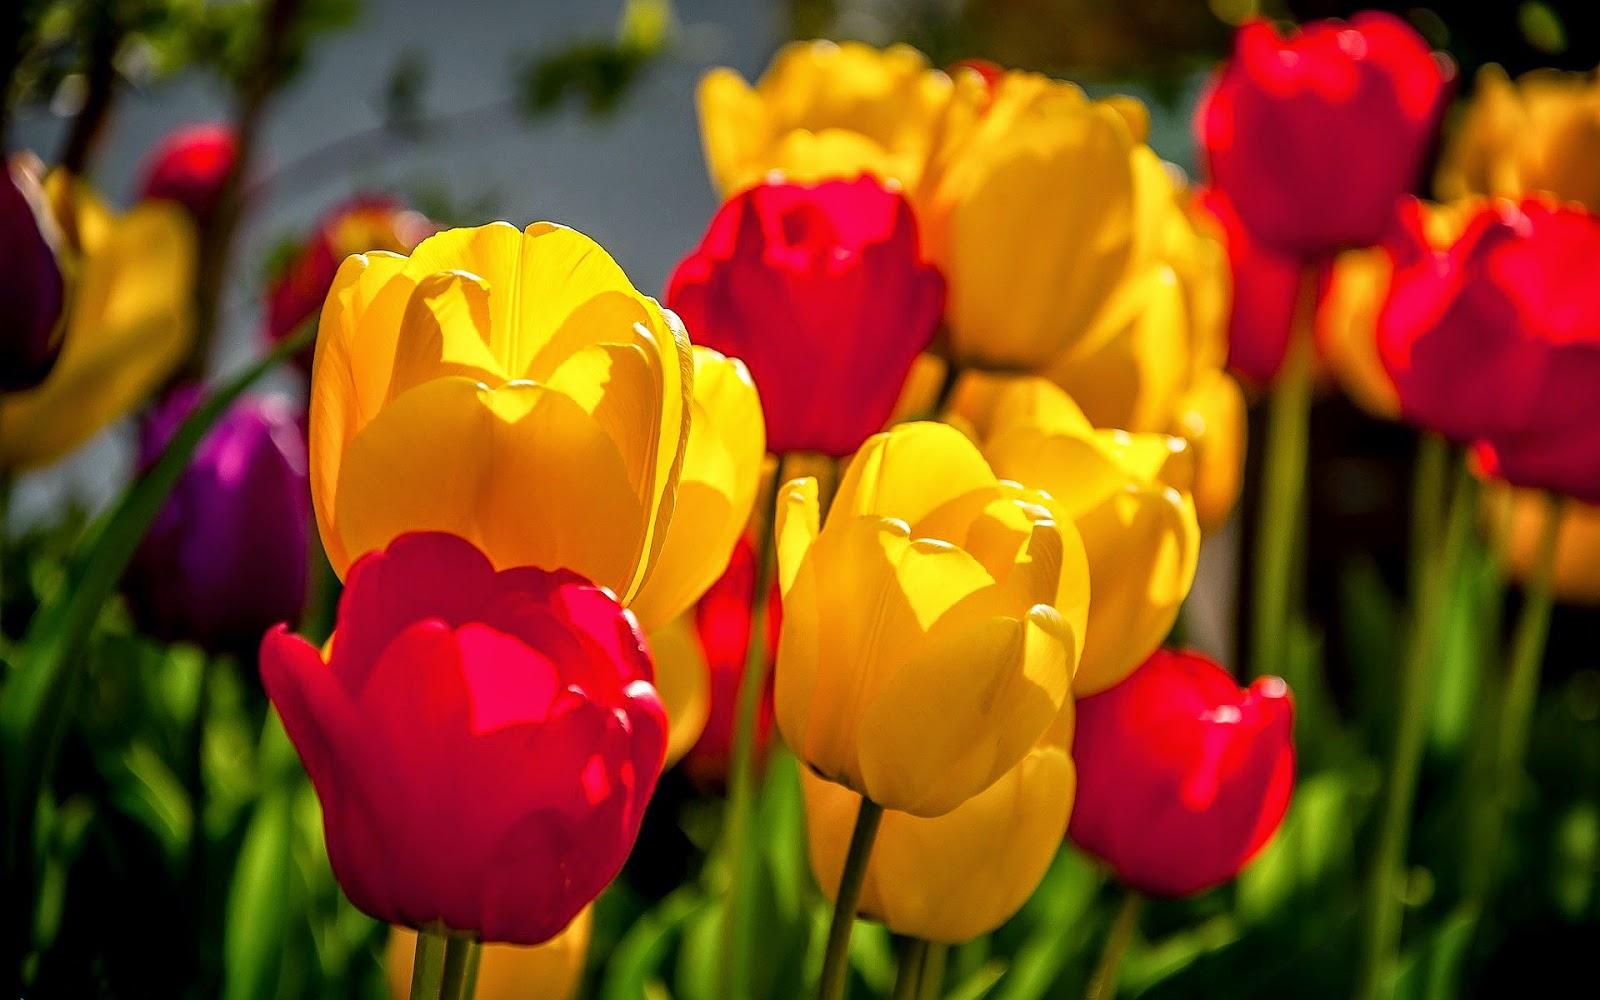 Lente foto met rode en gele tulpen